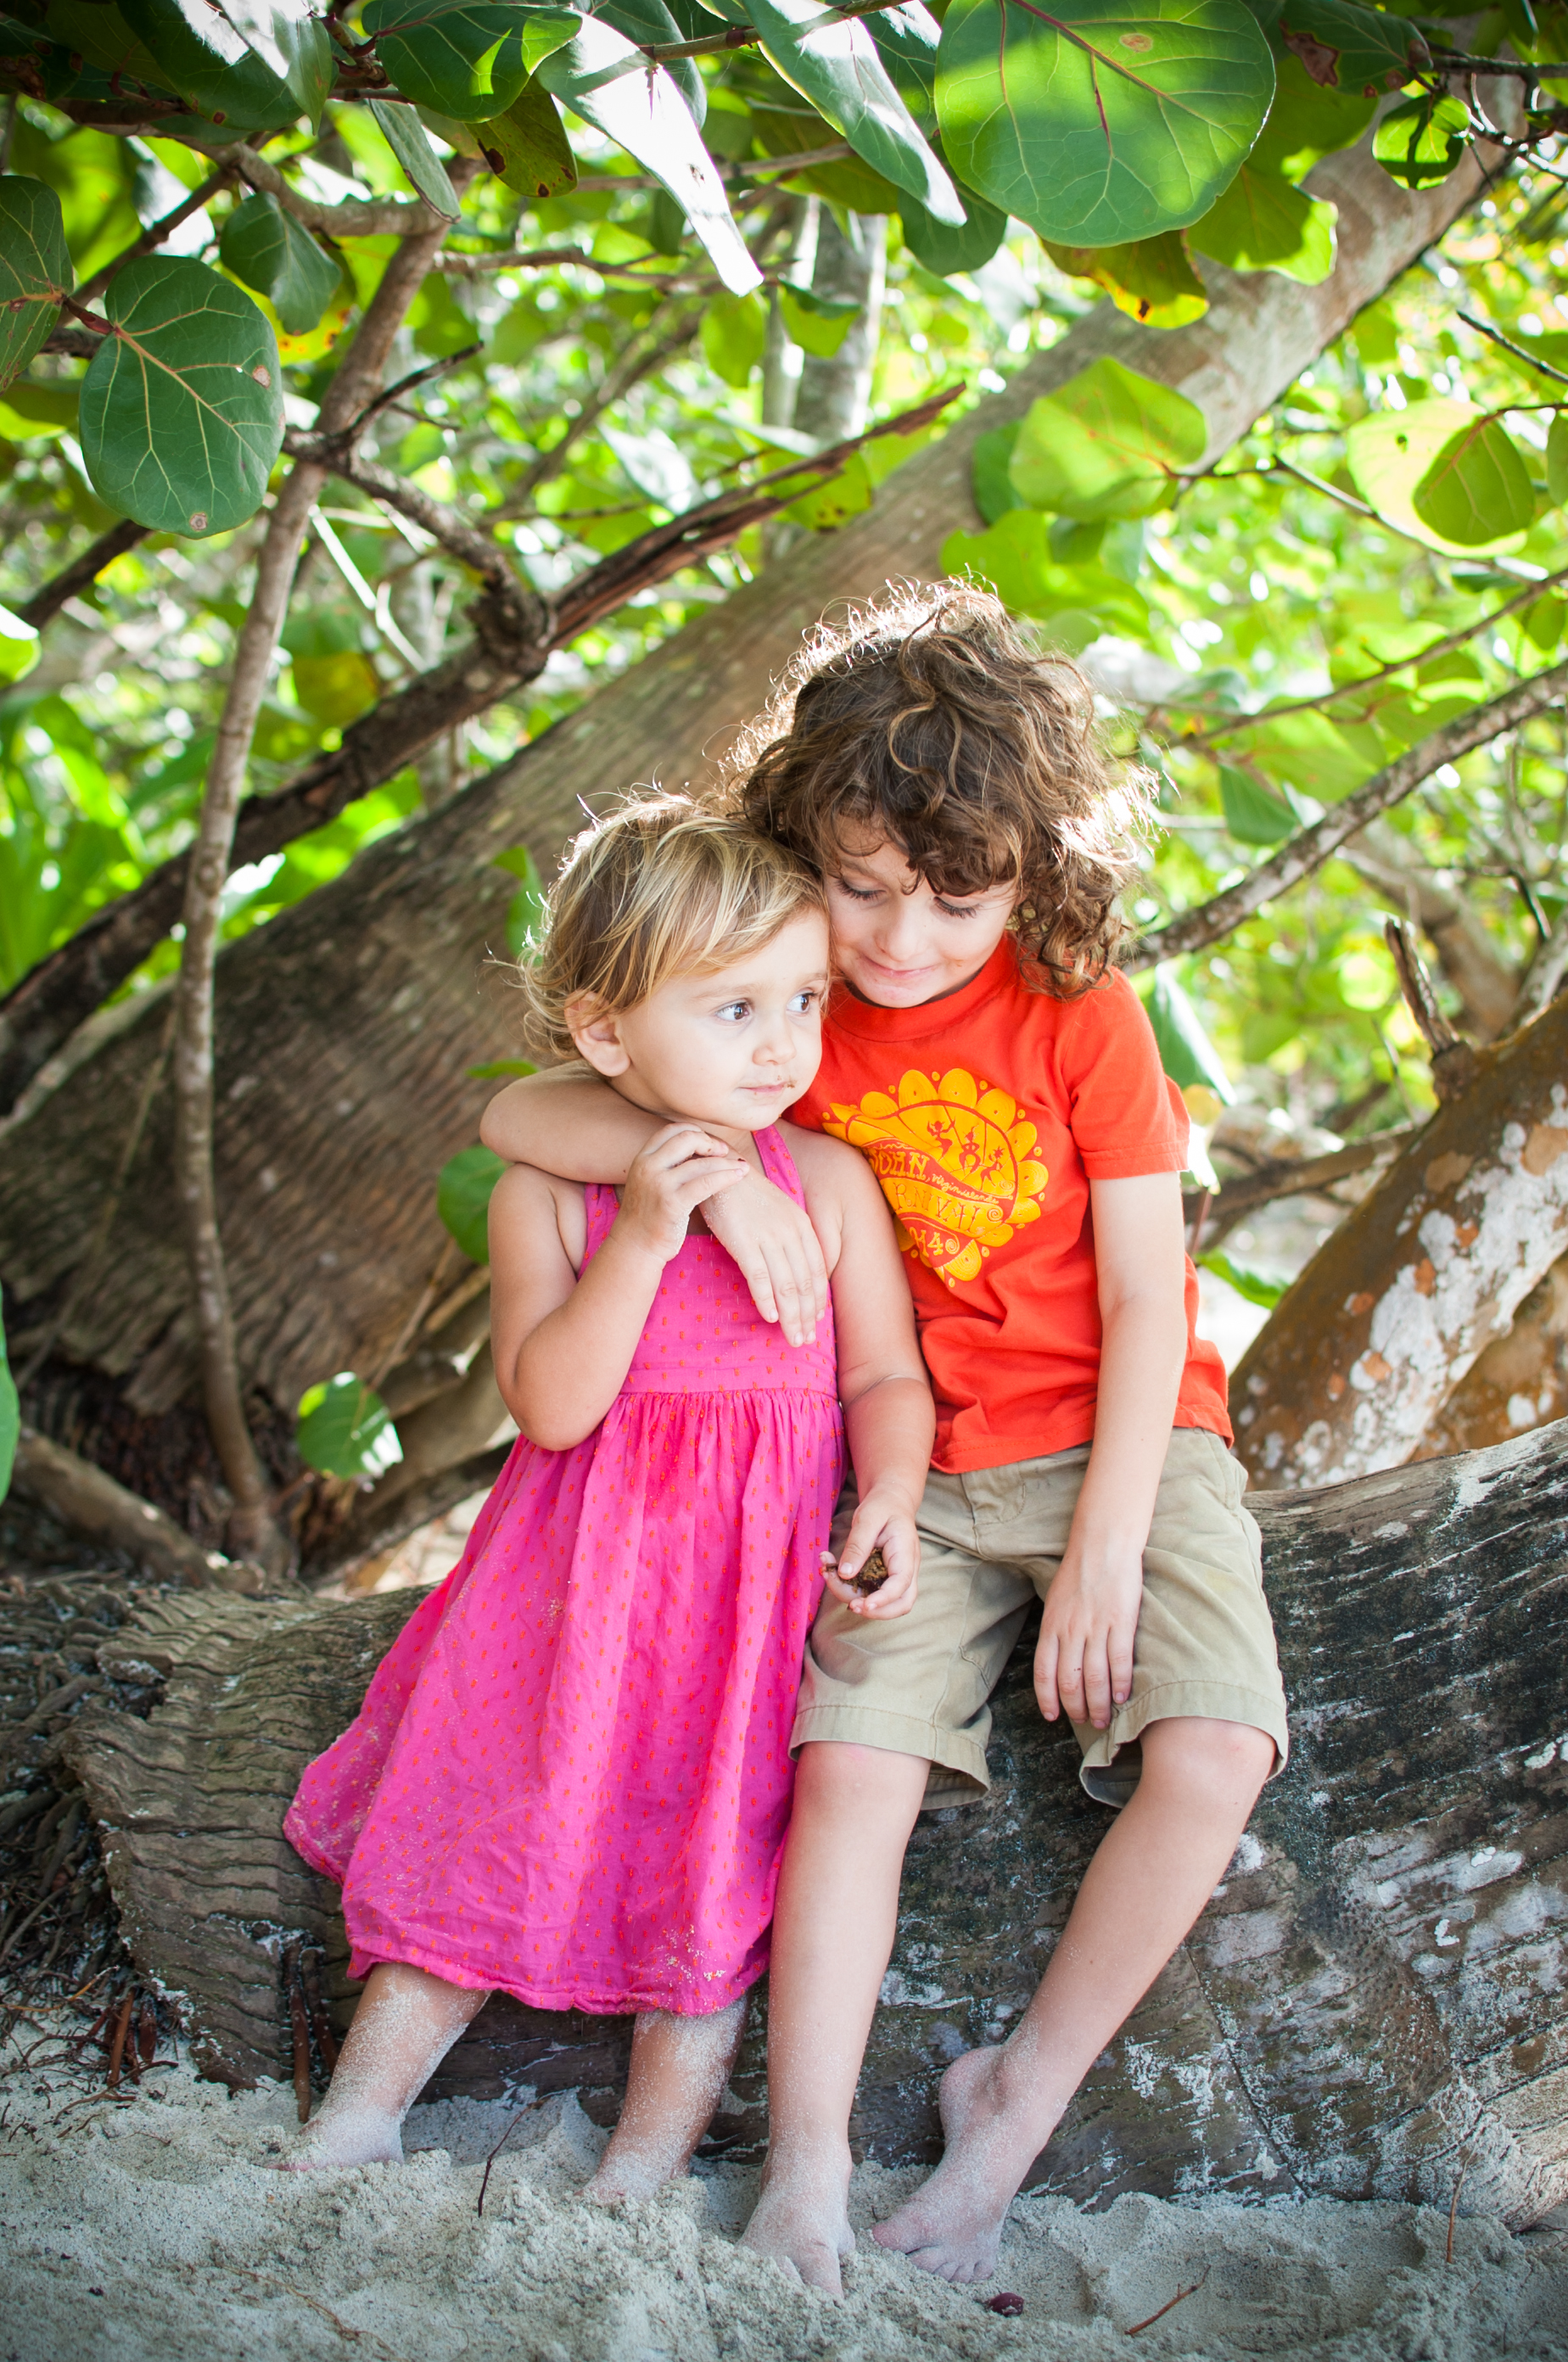 brian and tashi hanging under tree 4.jpg